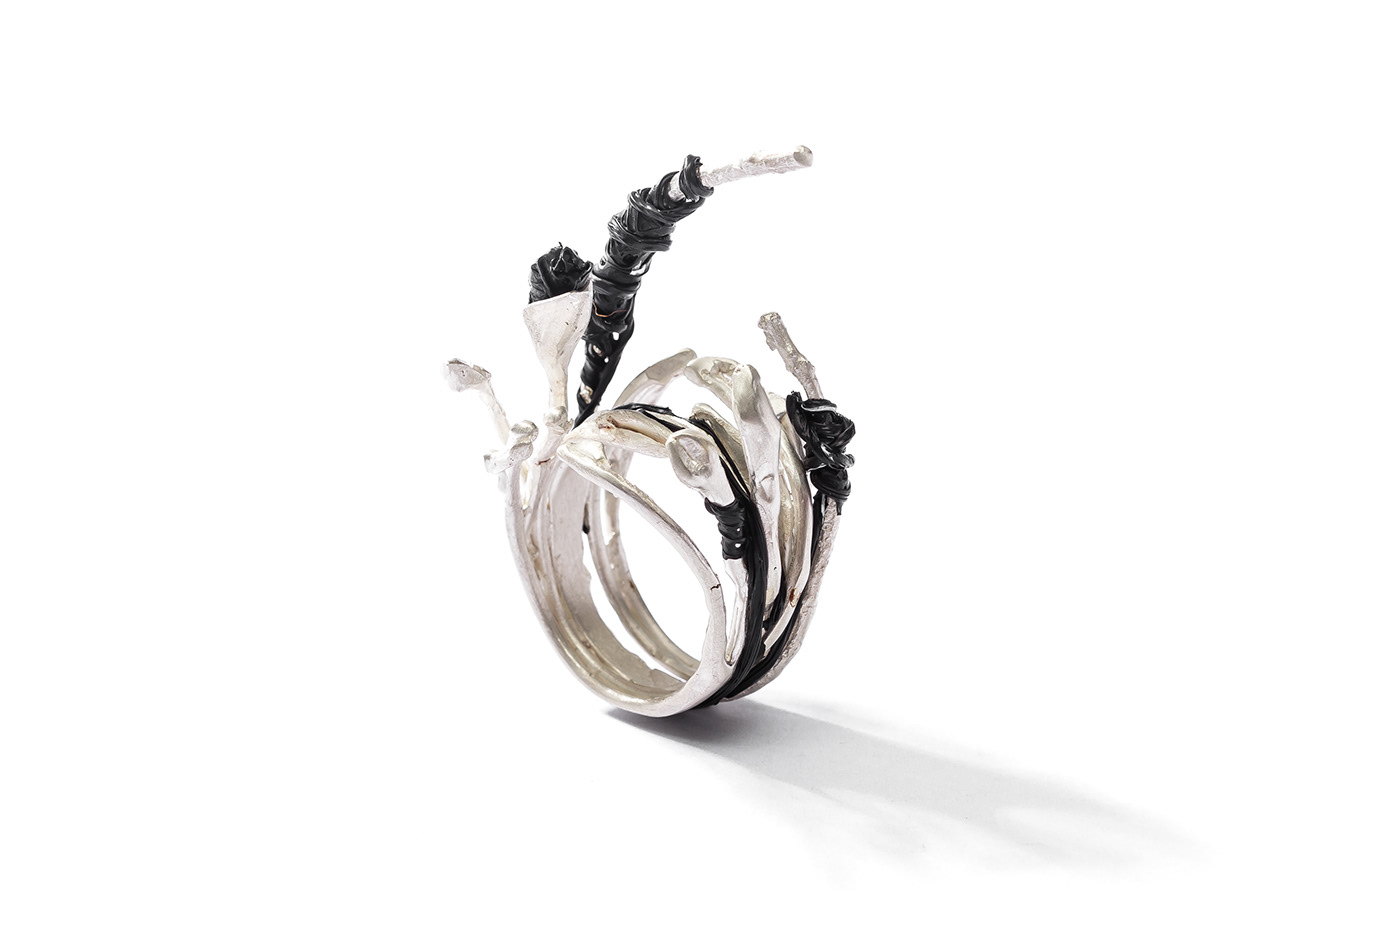 contemporary jewelery  contemporary jewelry Delta delta tigre jewelery jewelry joyeria Joyería contemporánea mabel pena